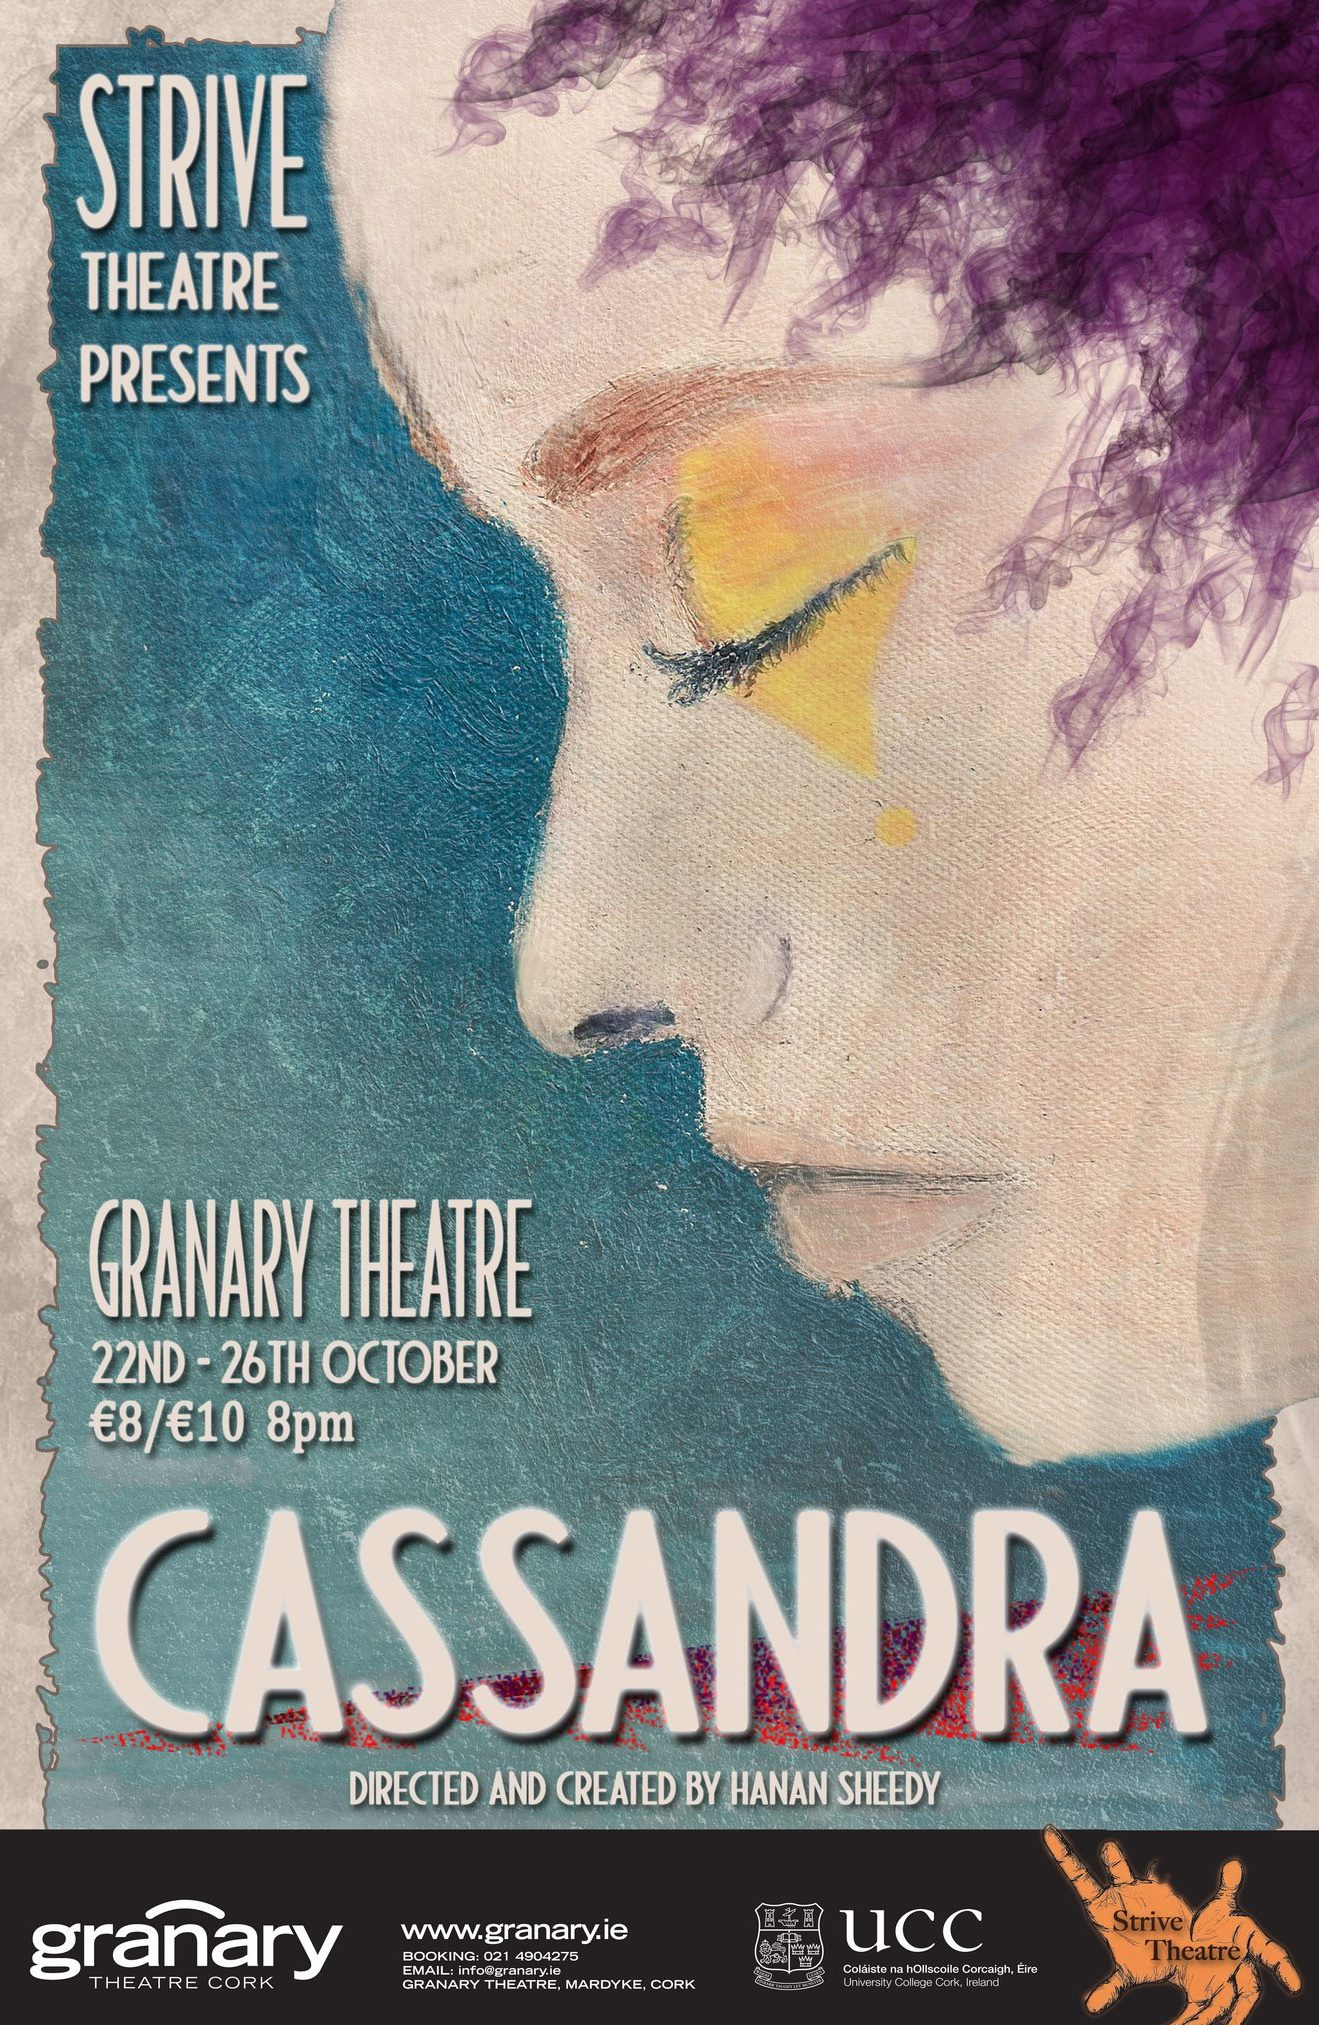 Cassandra Poster.jpg